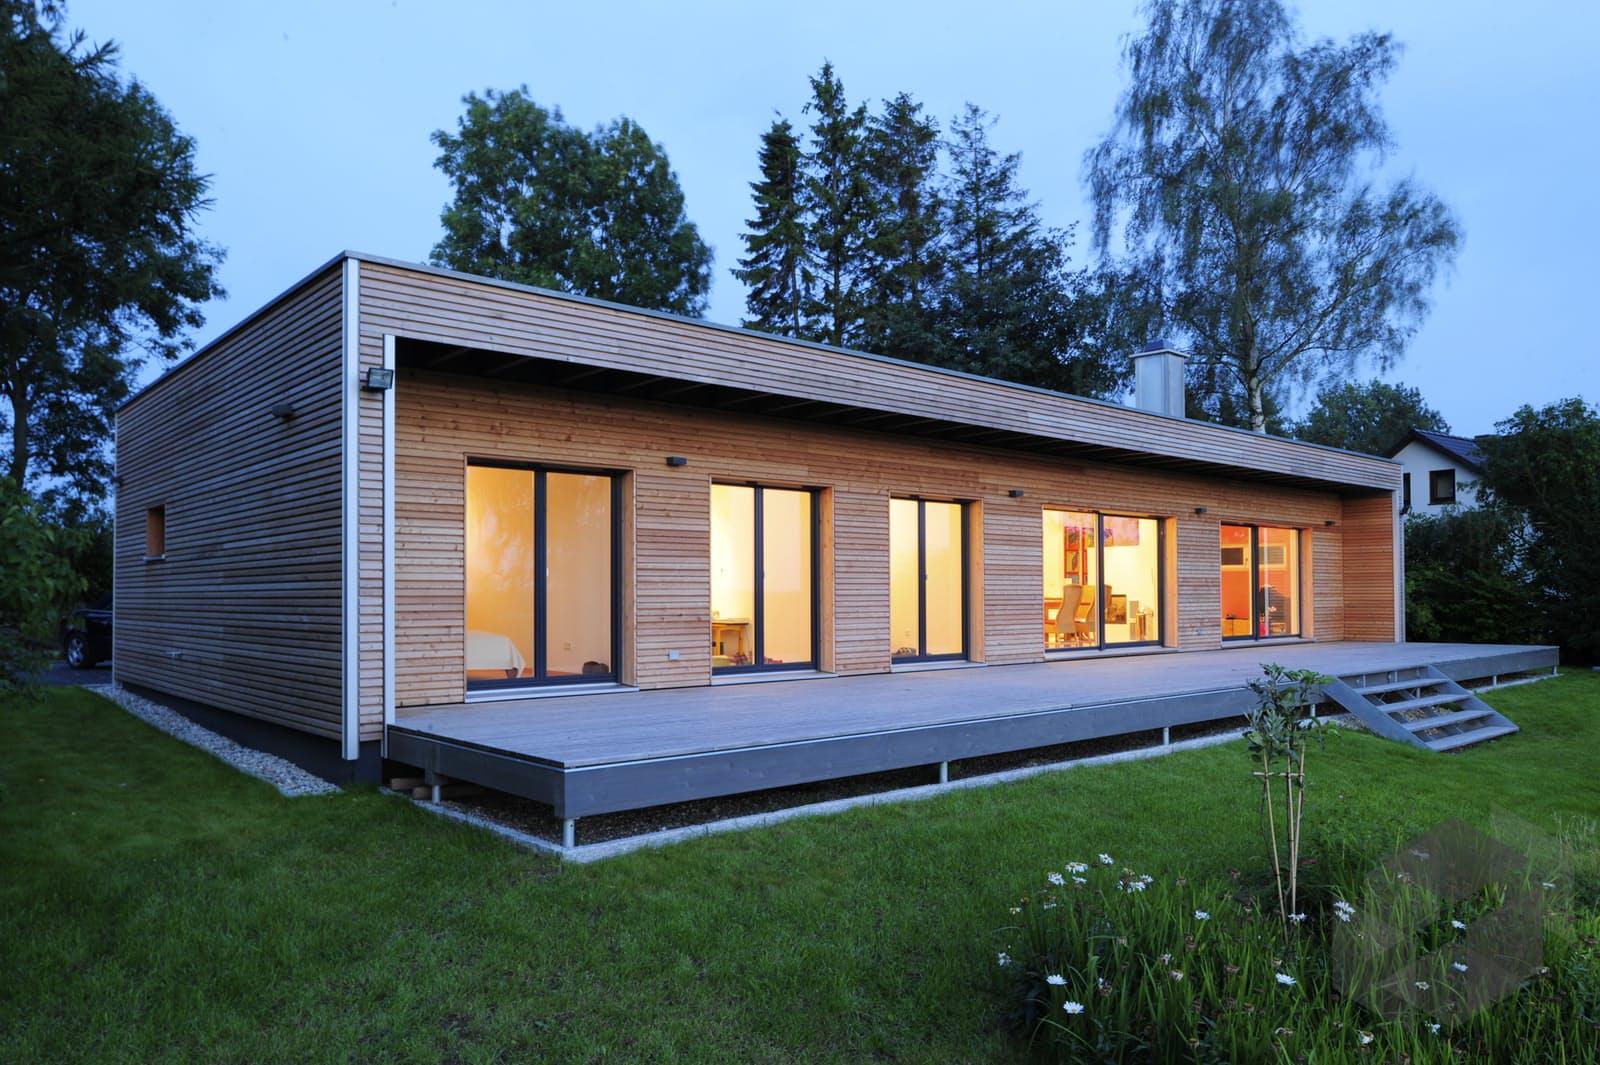 individuelle planung moderner bungalow von baufritz komplette daten bersicht. Black Bedroom Furniture Sets. Home Design Ideas